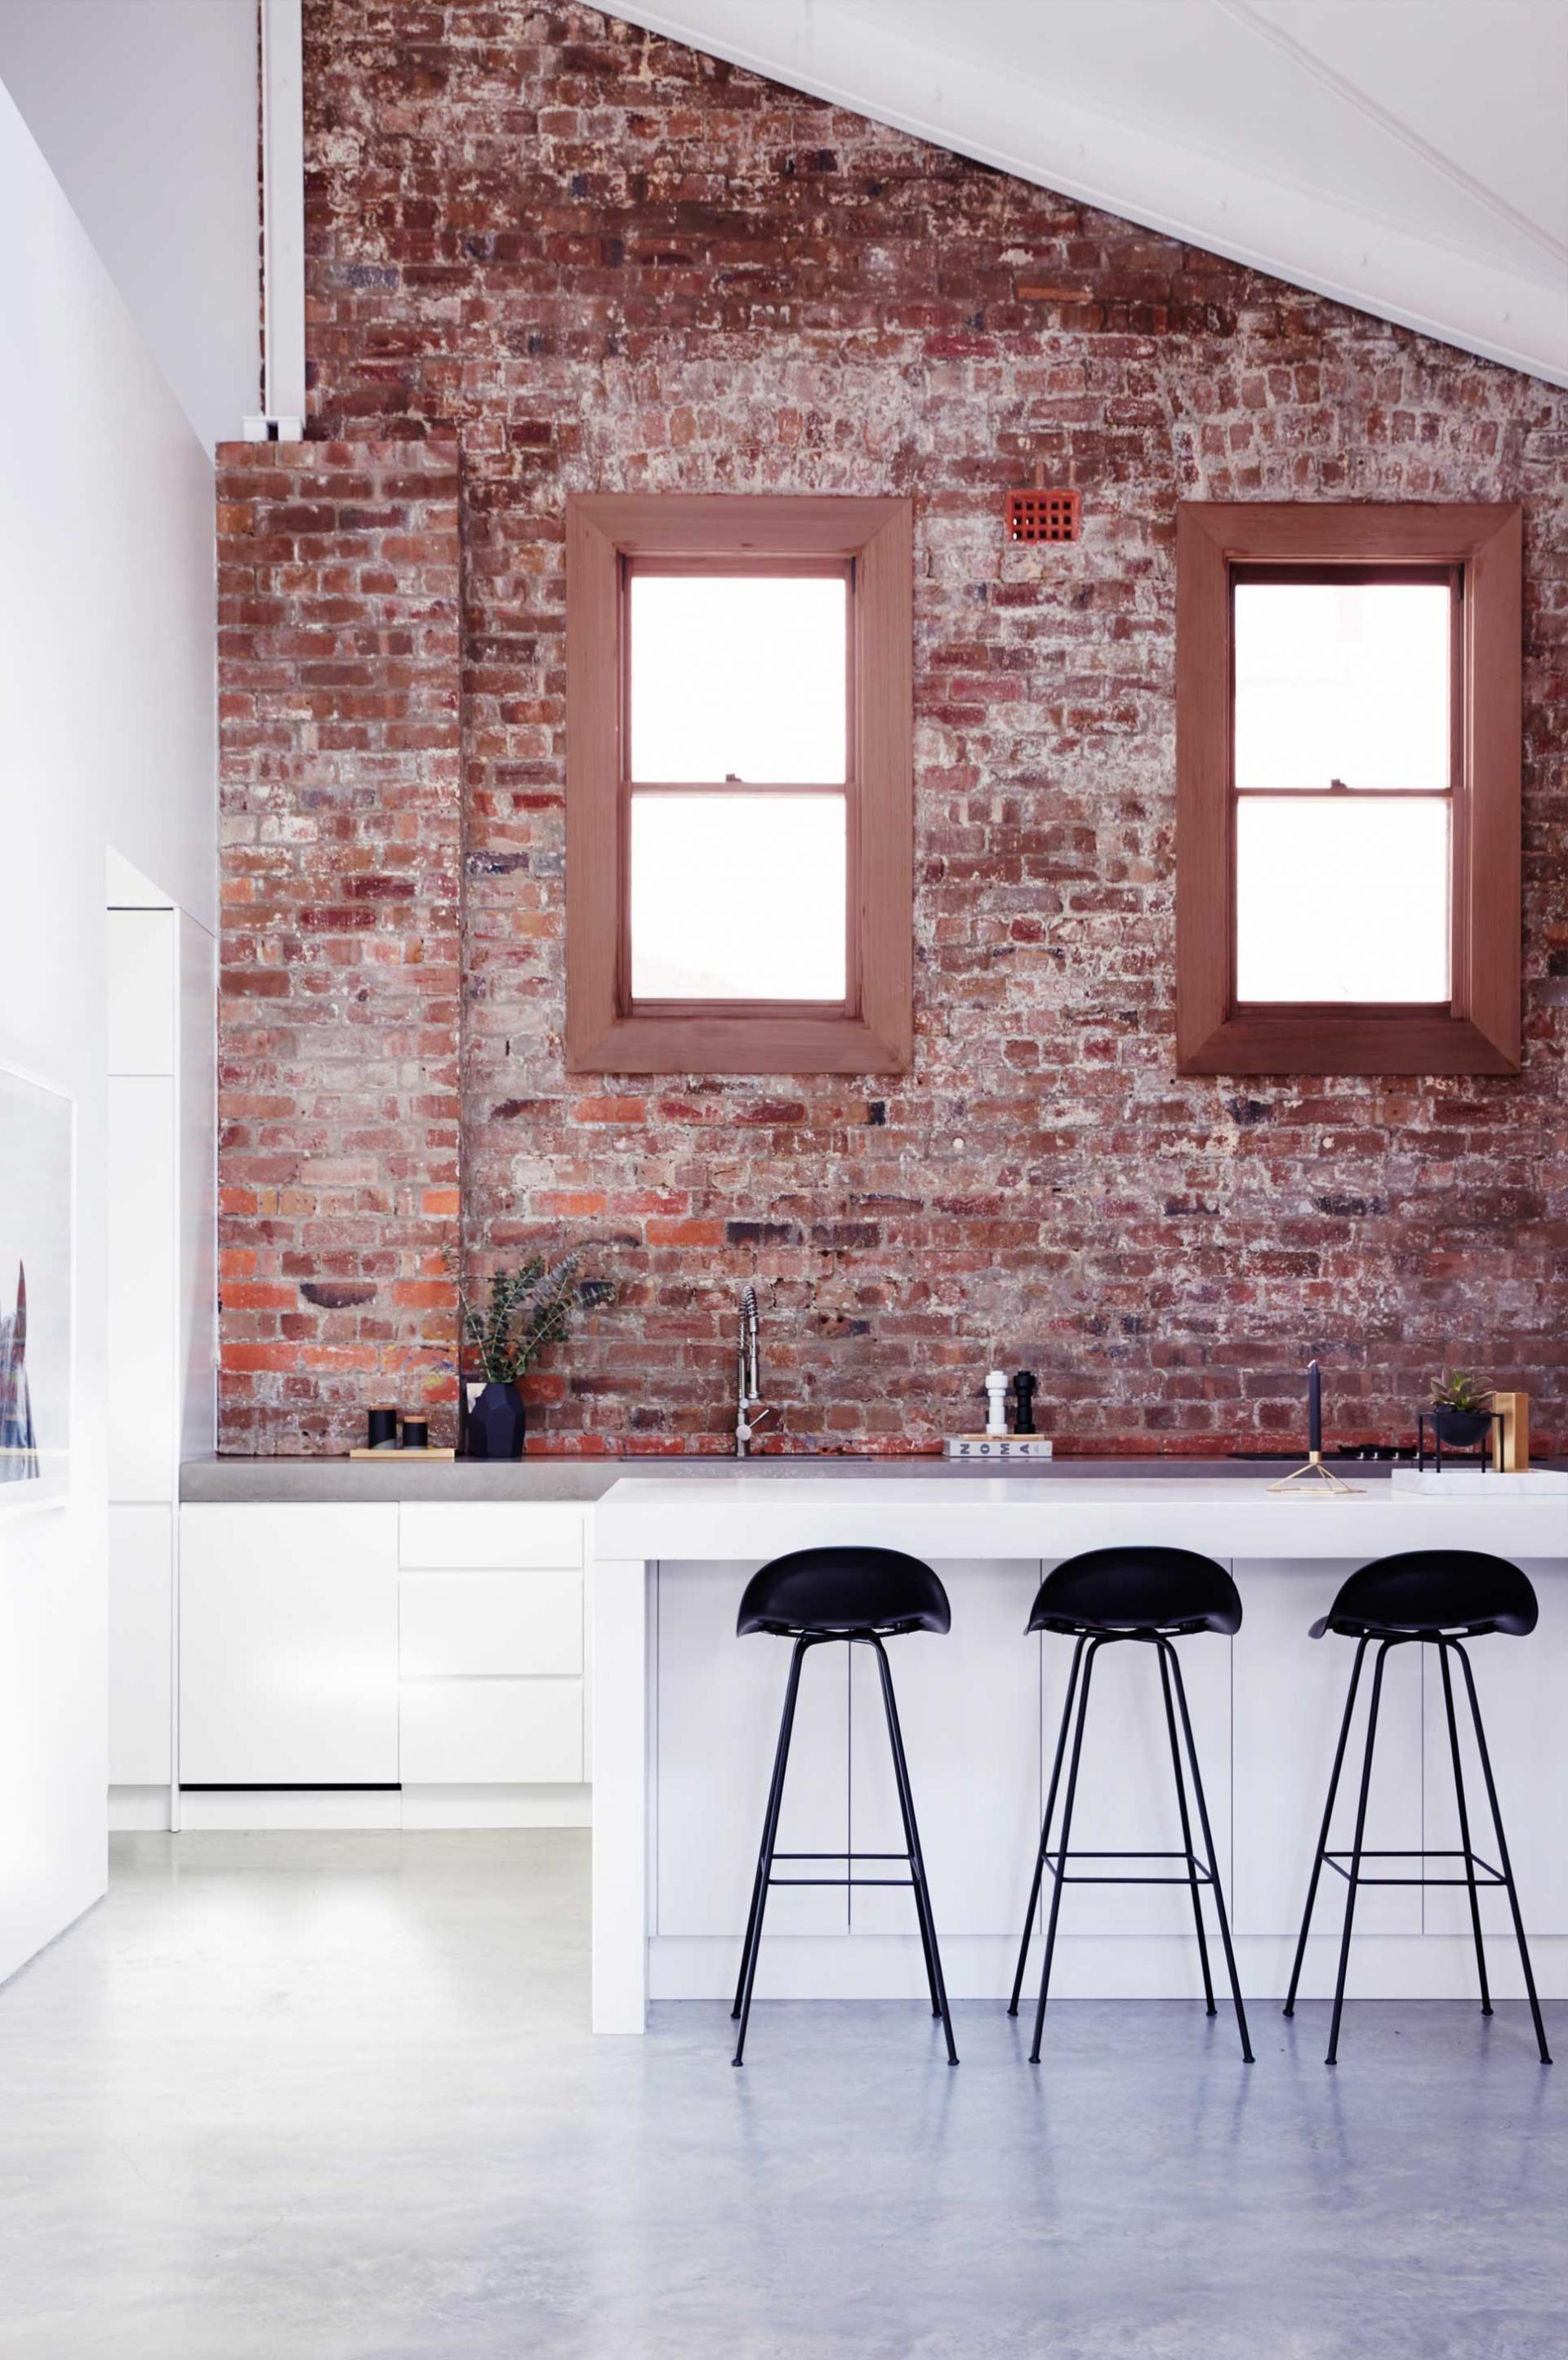 An Industrial Loft Like Family Home Brick Interior Brick Interior Wall Brick Wall Kitchen